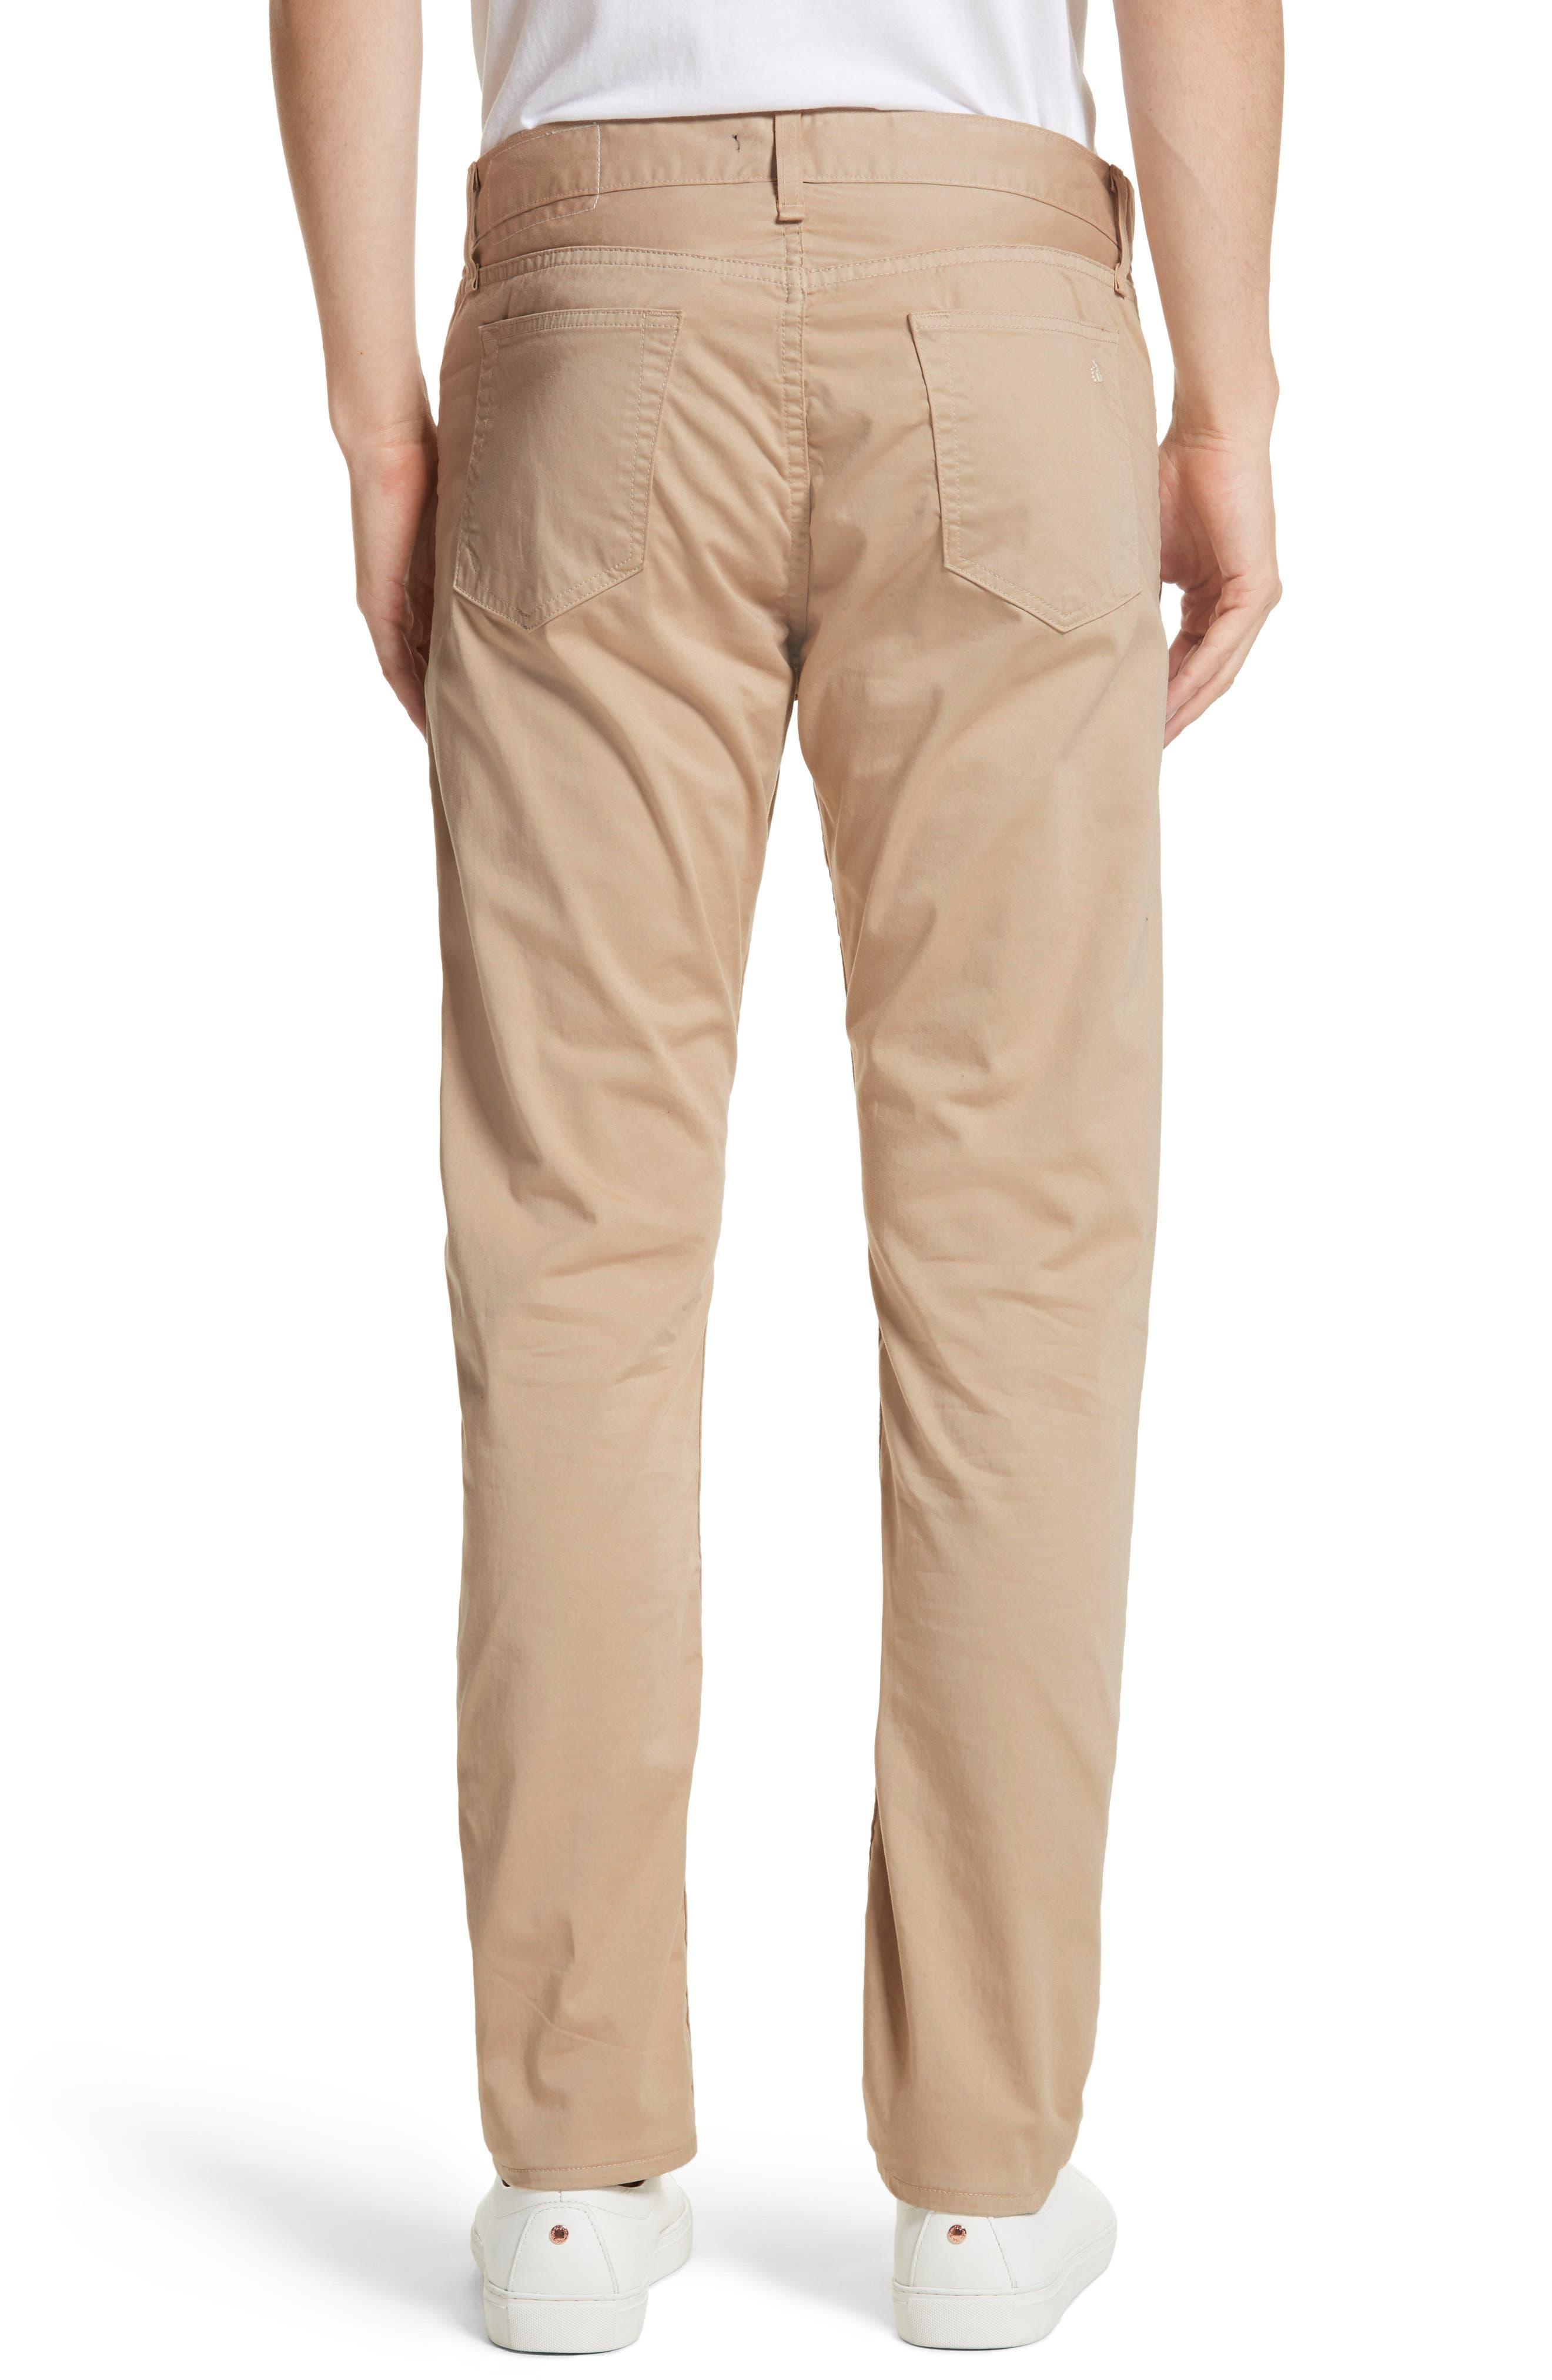 Fit 2 Five-Pocket Twill Pants,                             Alternate thumbnail 2, color,                             BEIGE